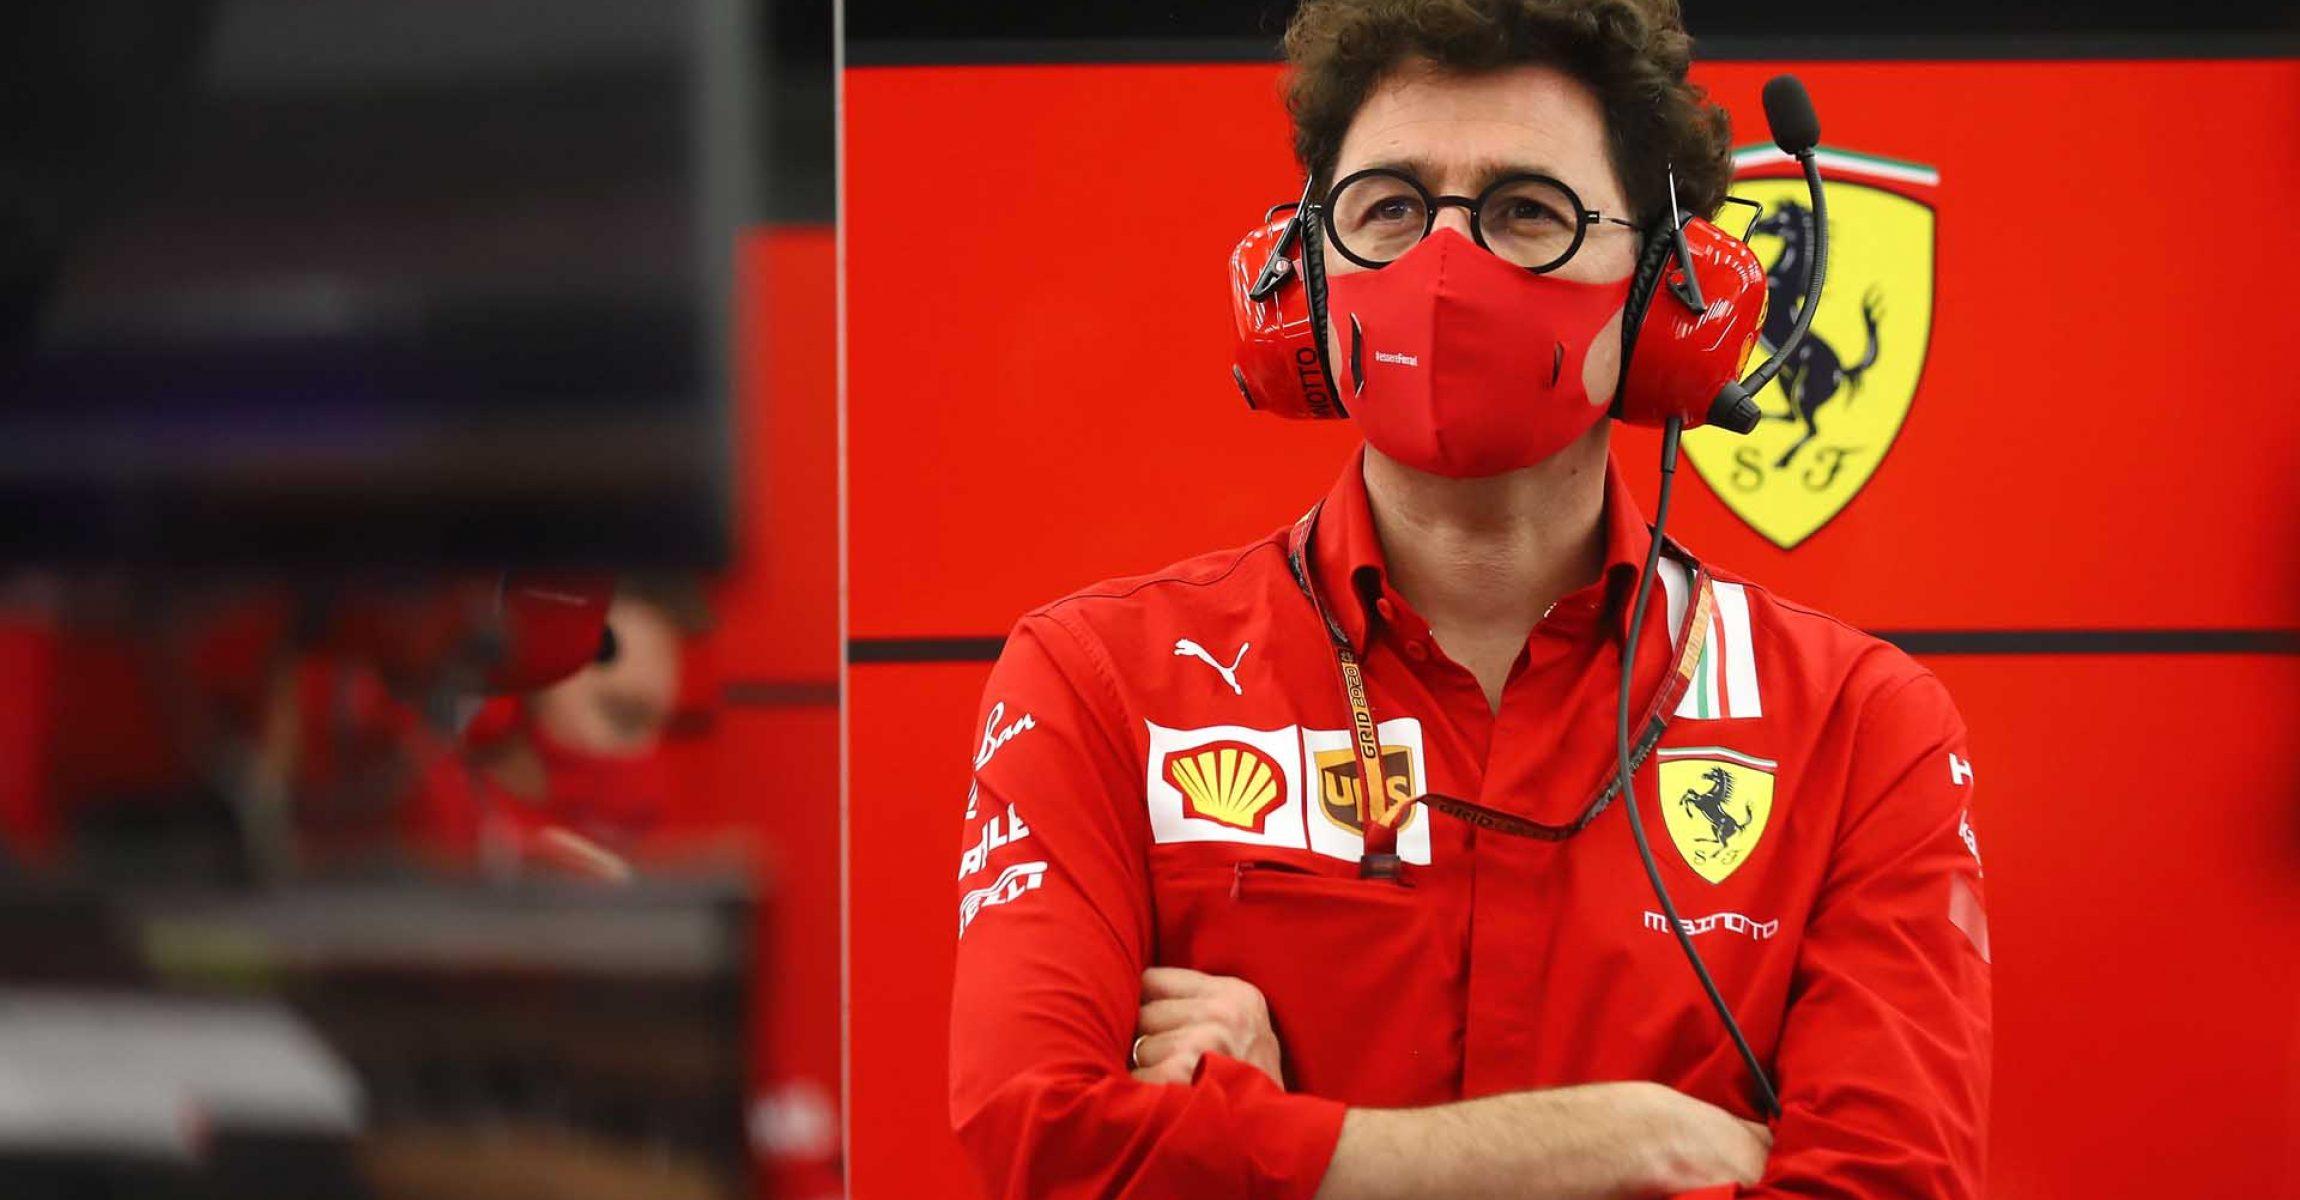 GP SAKHIR  F1/2020 - VENERDÌ 04/12/2020      credit: @Scuderia Ferrari Press Office Mattia Binotto